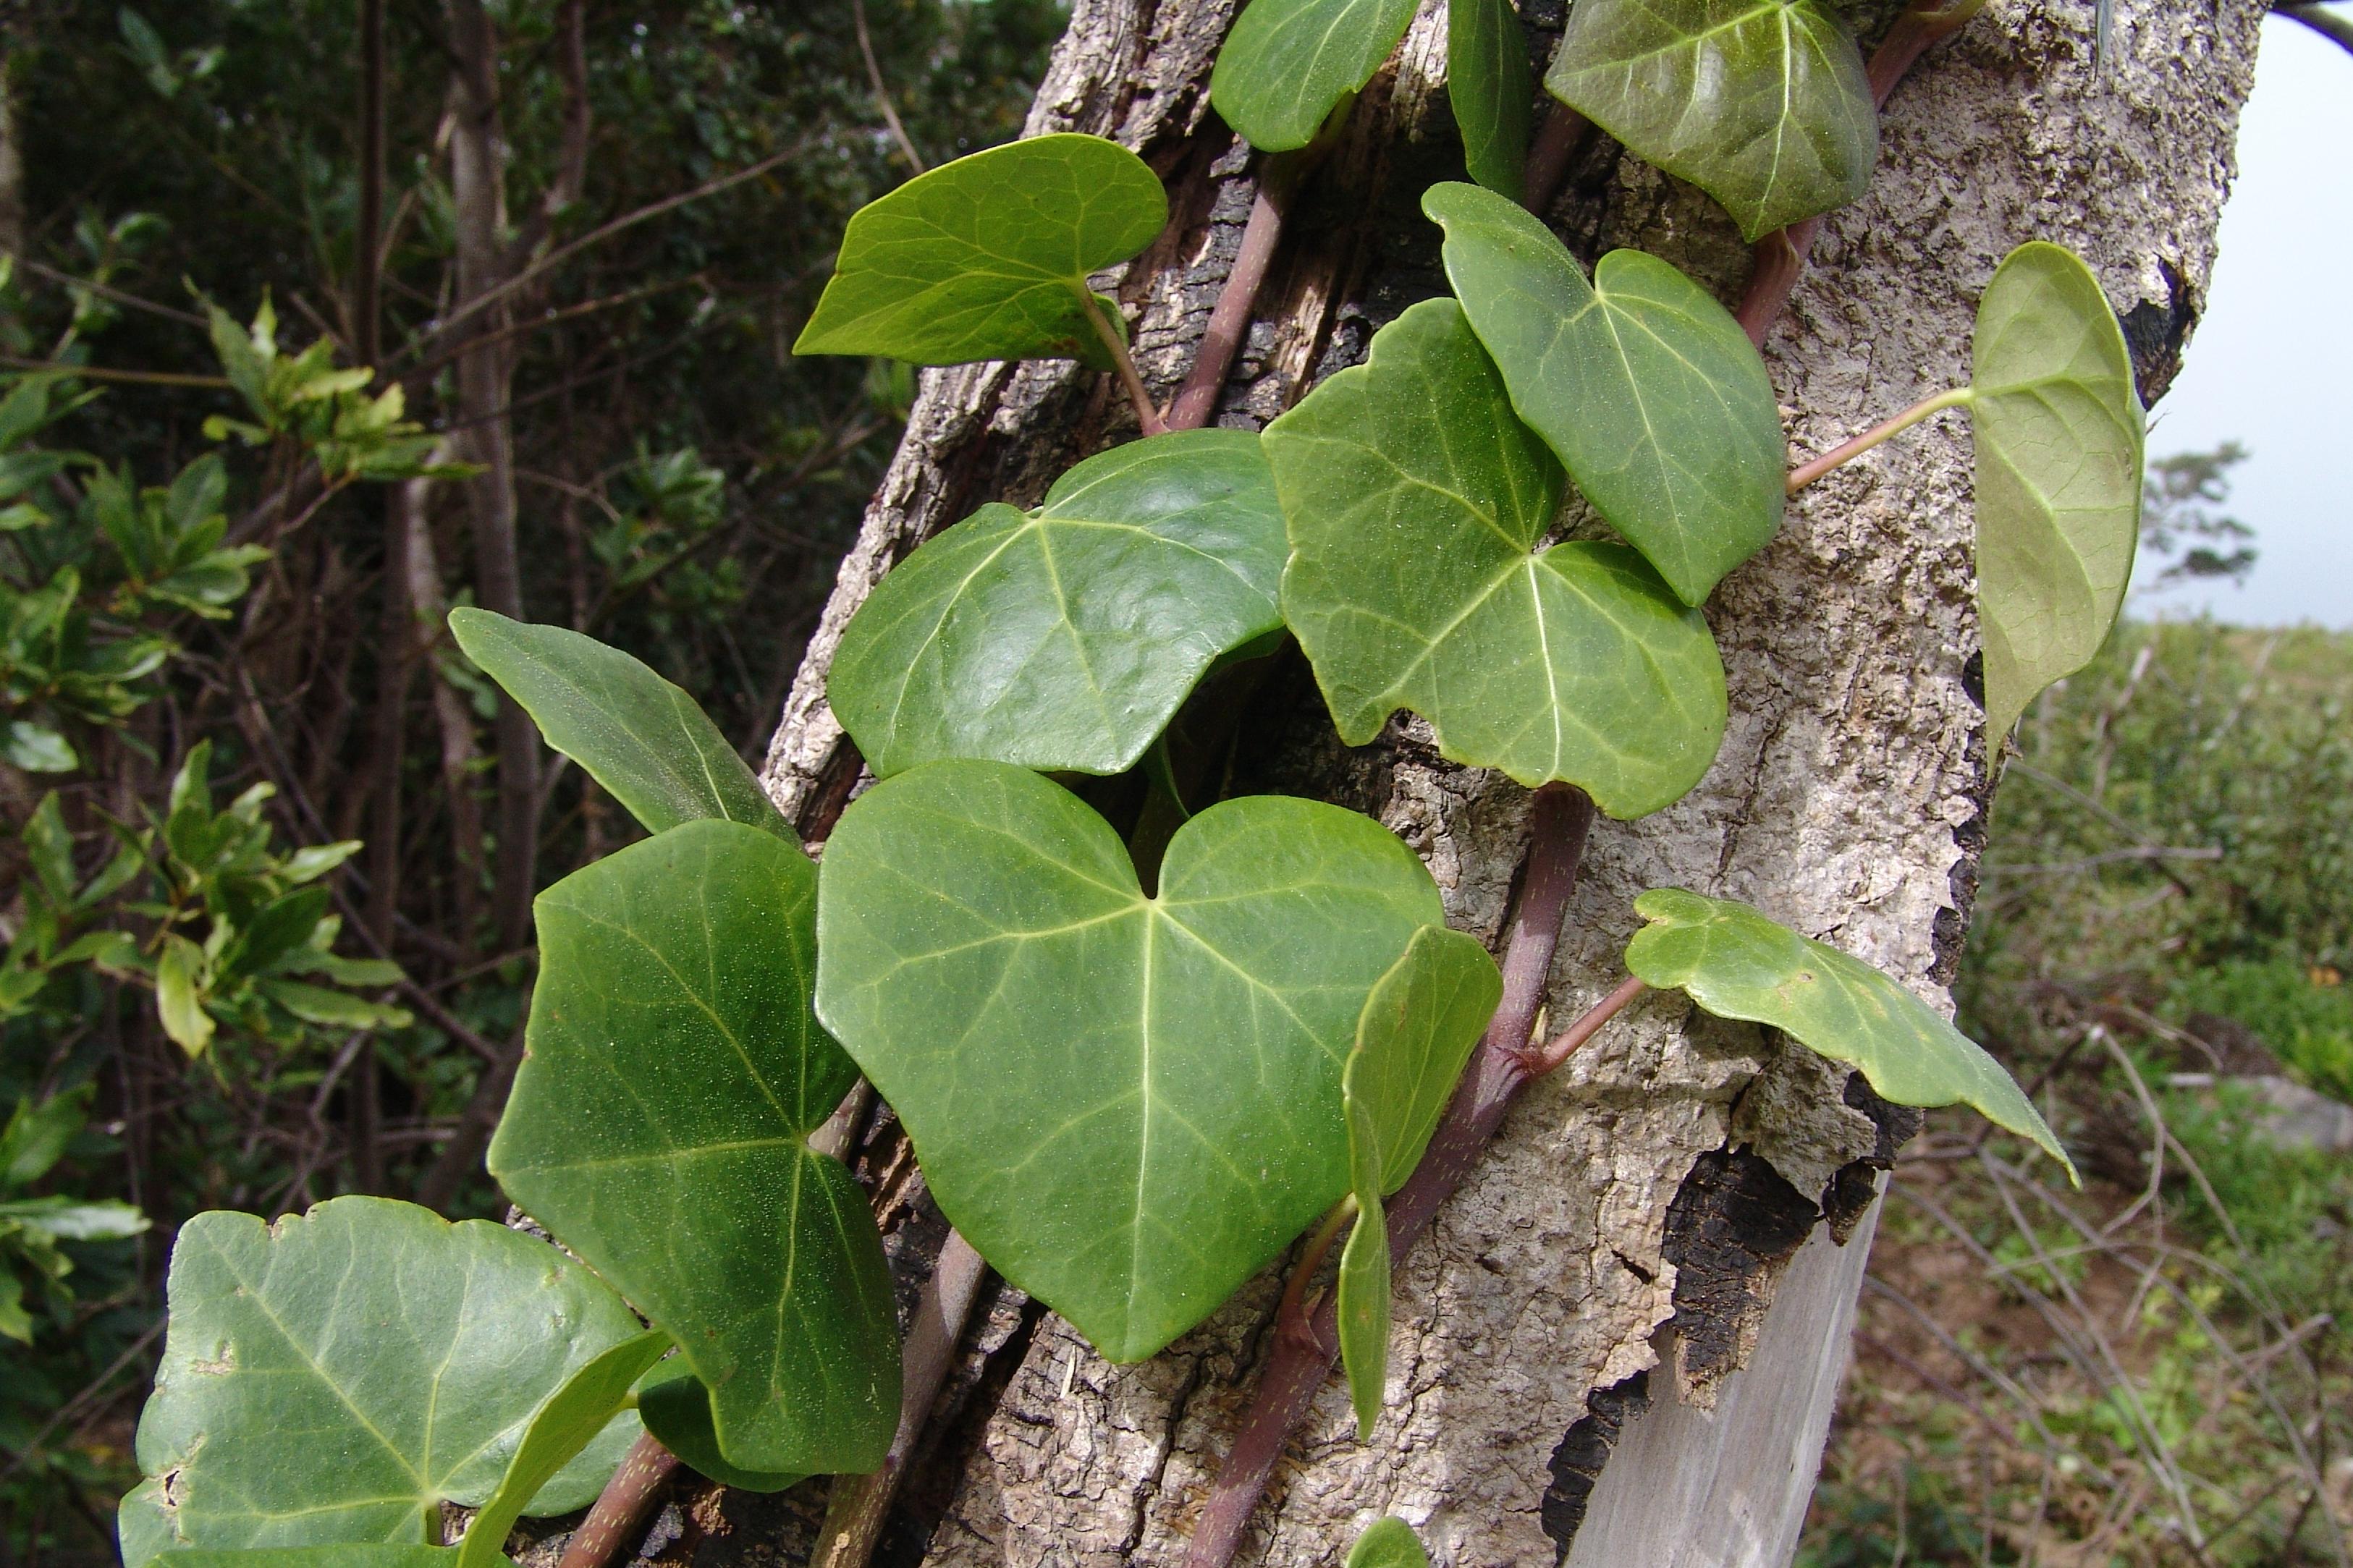 dsc09275-hojas-hedera-a-10.jpg